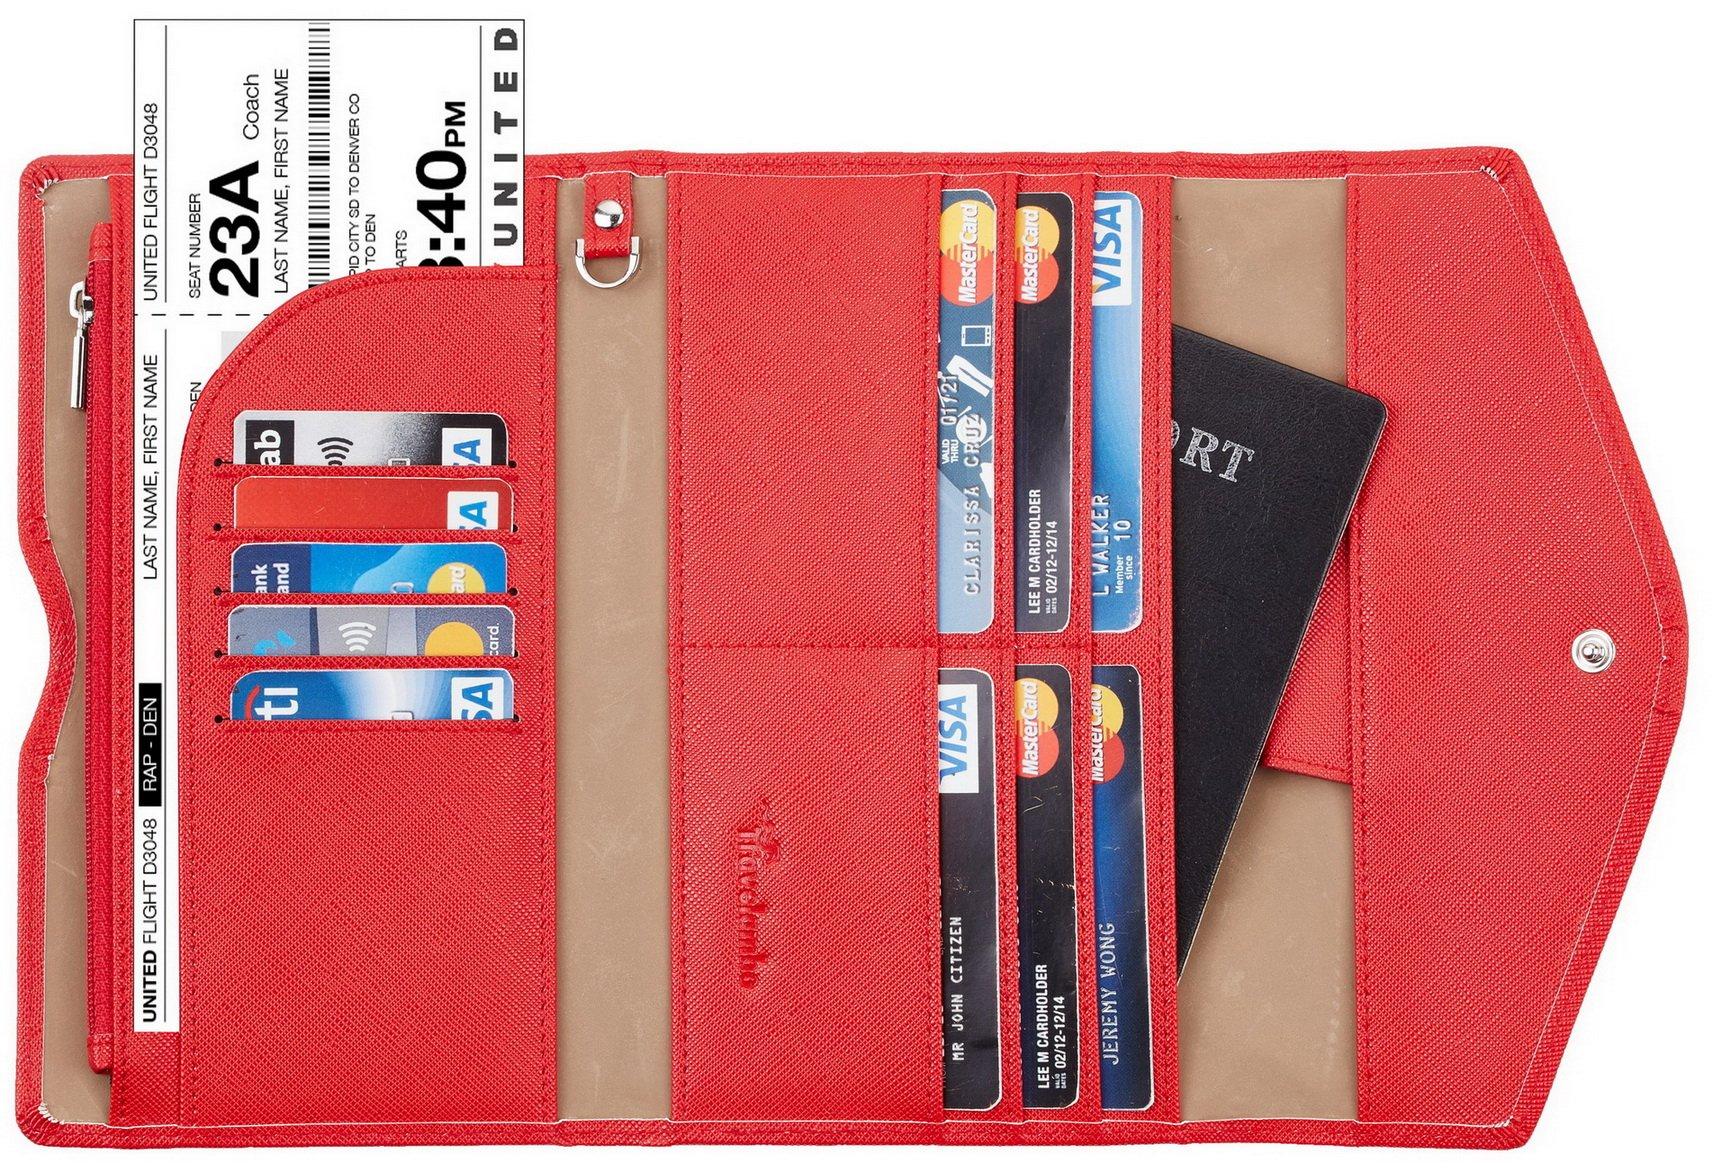 1pcs,2pcs,4pcs Mandala Pu Leather Double Sides Print Round Luggage Tag Mutilple Packs